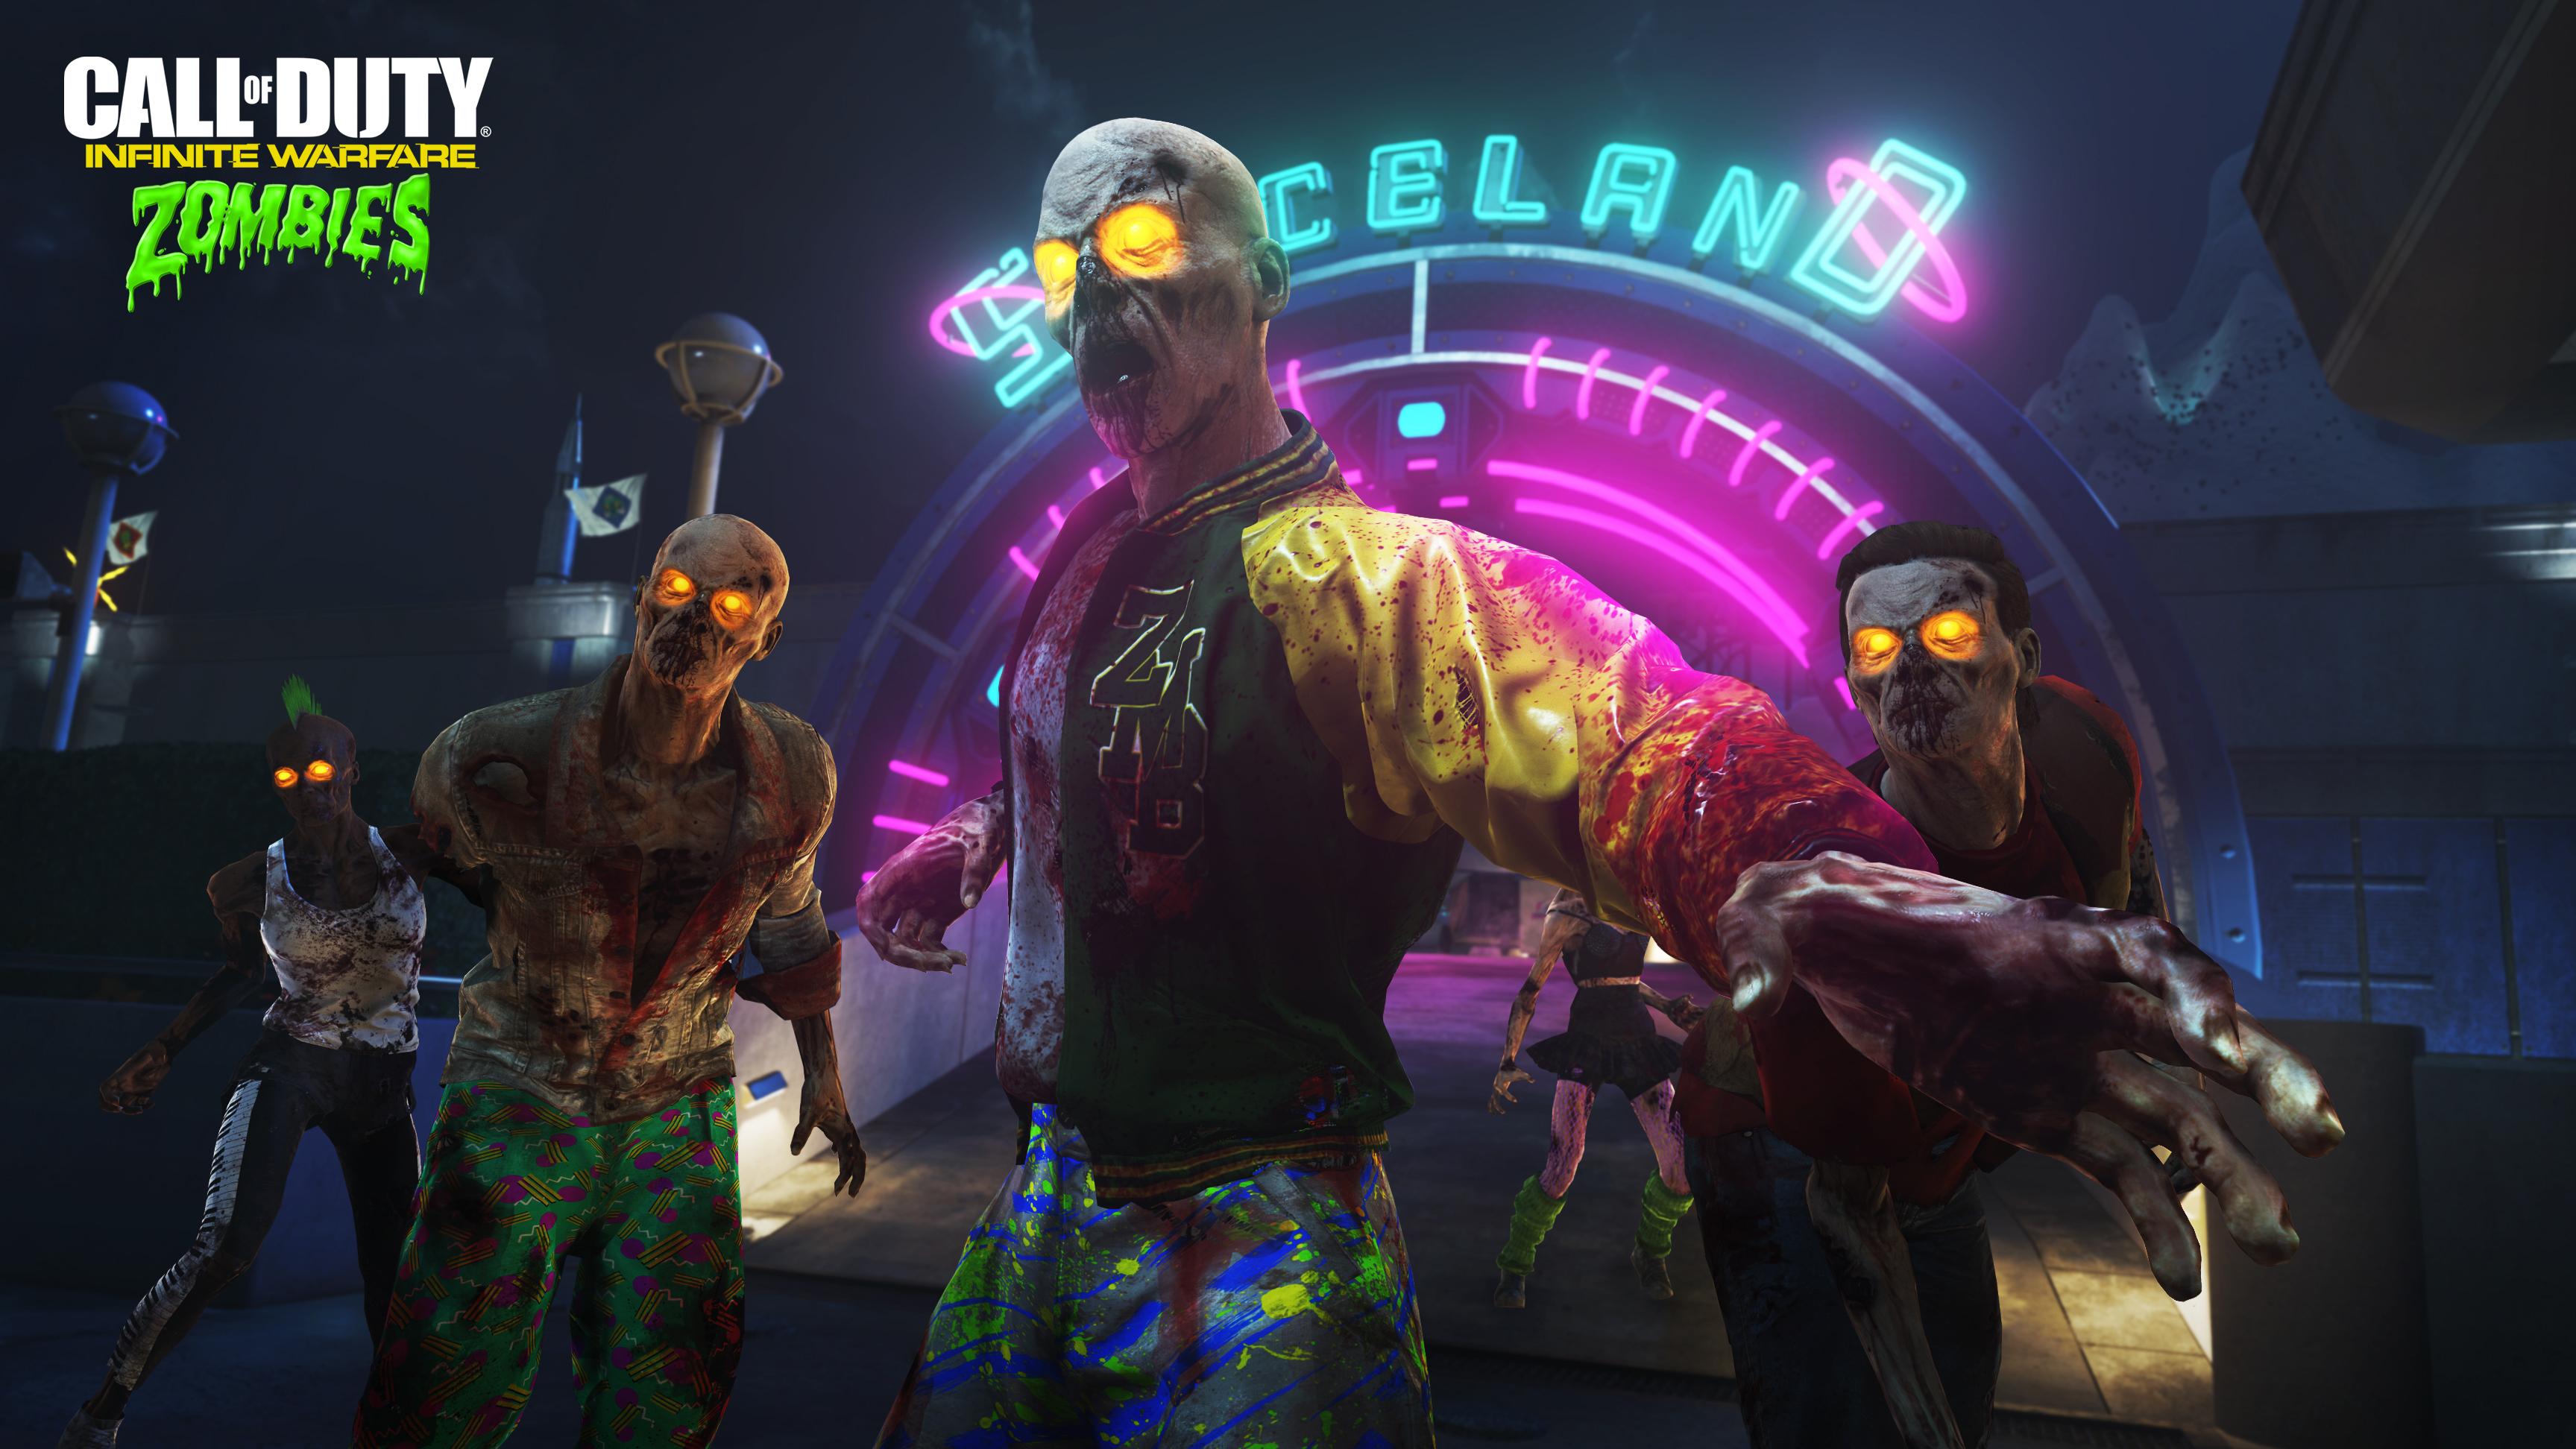 Call of Duty Infinite Warfare Zombies Spaceland обои скачать